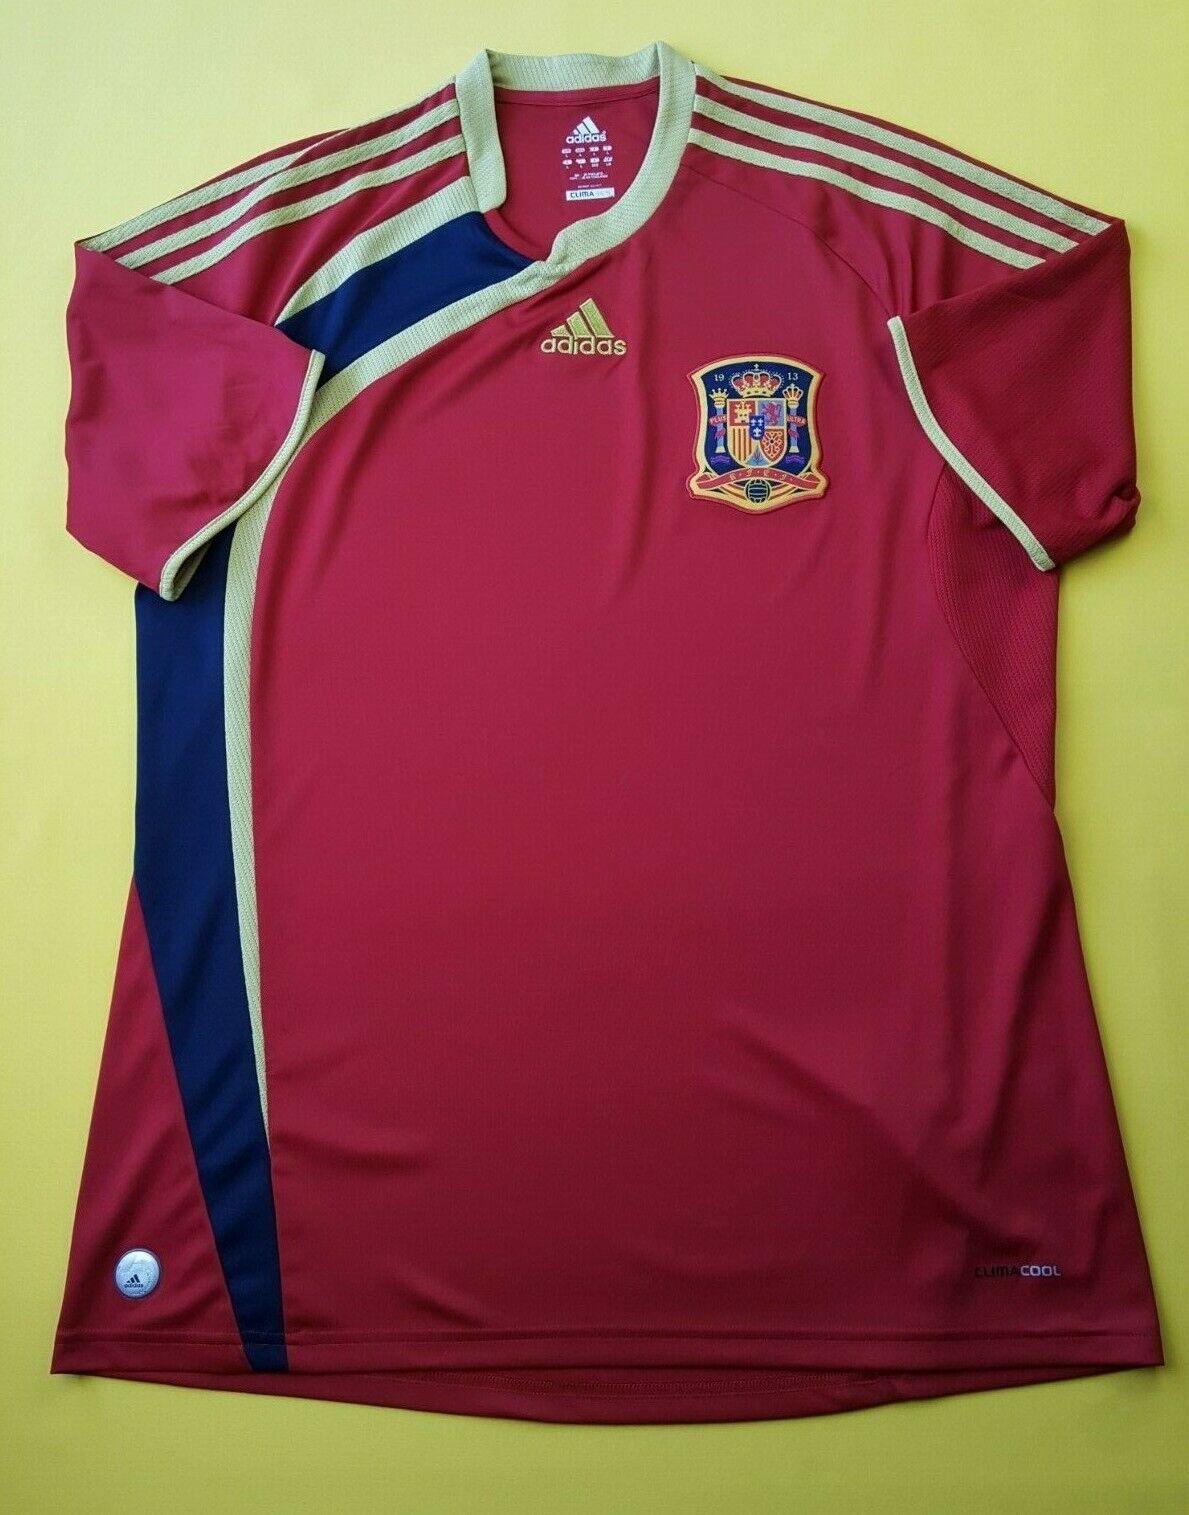 5 5 España Fútbol Jersey Camisa Grande 2009 2010 Hogar Fútbol Adidas ig93